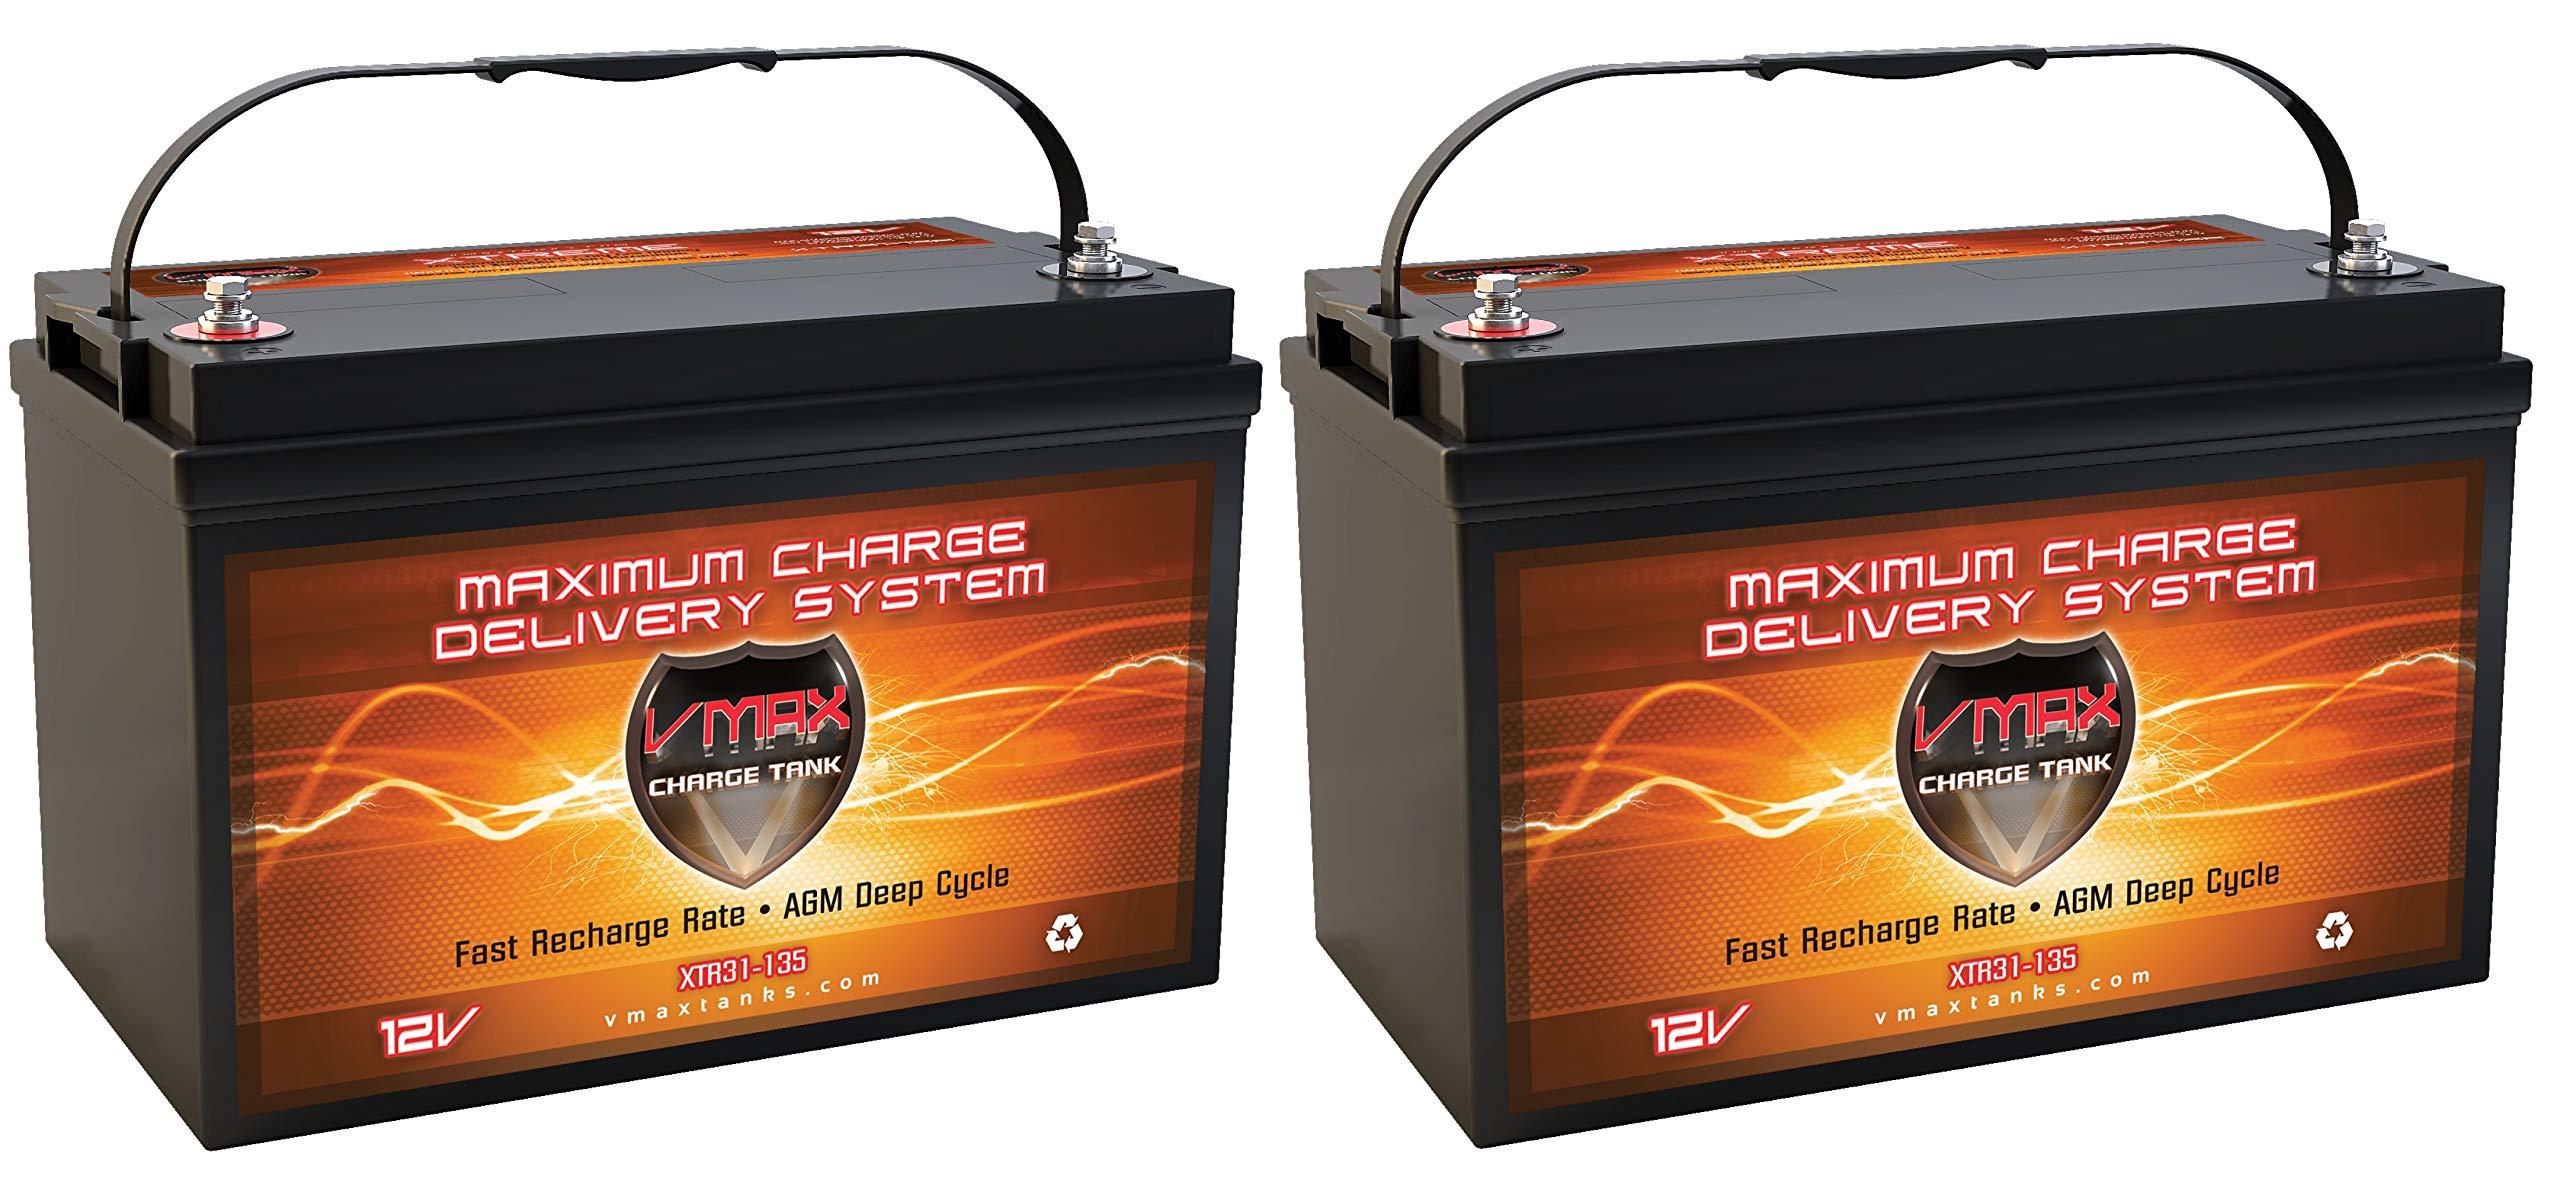 (2) XTR31-135 24 Volt Trolling Motor Batteries 135 Amp Hours VMAX Group 31 12V AGM Deep Cycle Maintenance-Free Sealed Marine 12 Volt 135Ah Battery for 24V Trolling Motors by VMAXTANKS